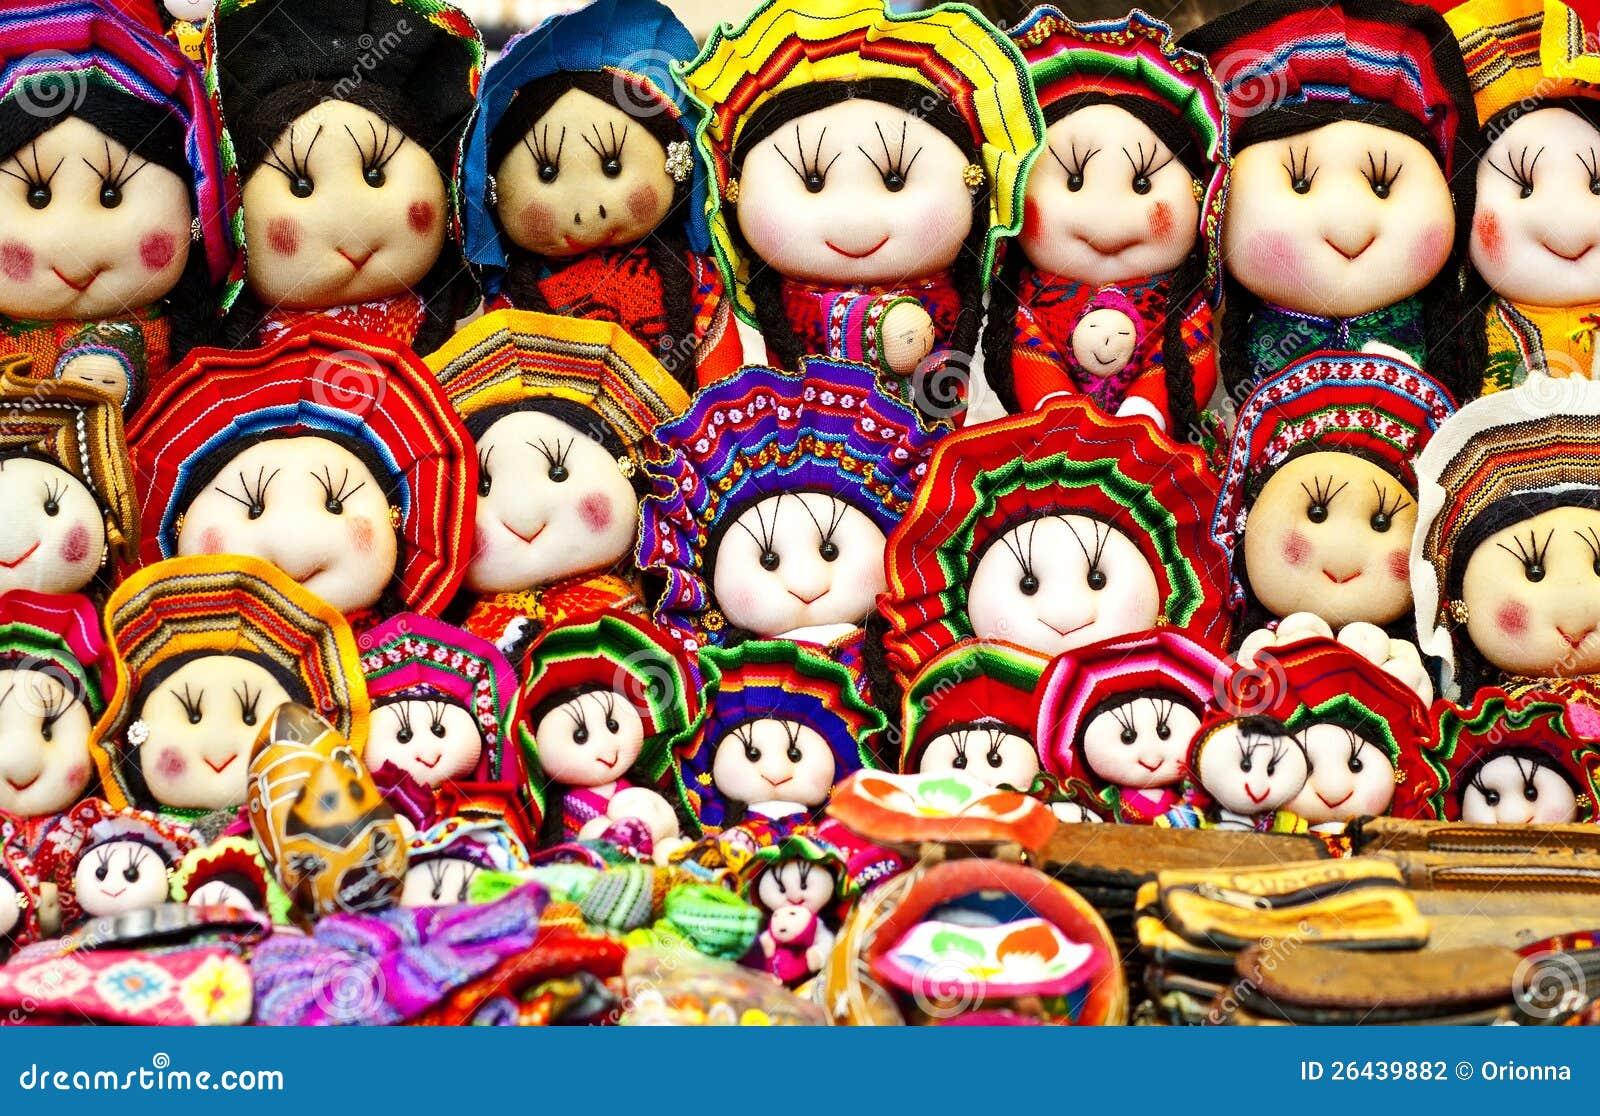 Handgemachte peruanische Puppen, Cuzco, Peru